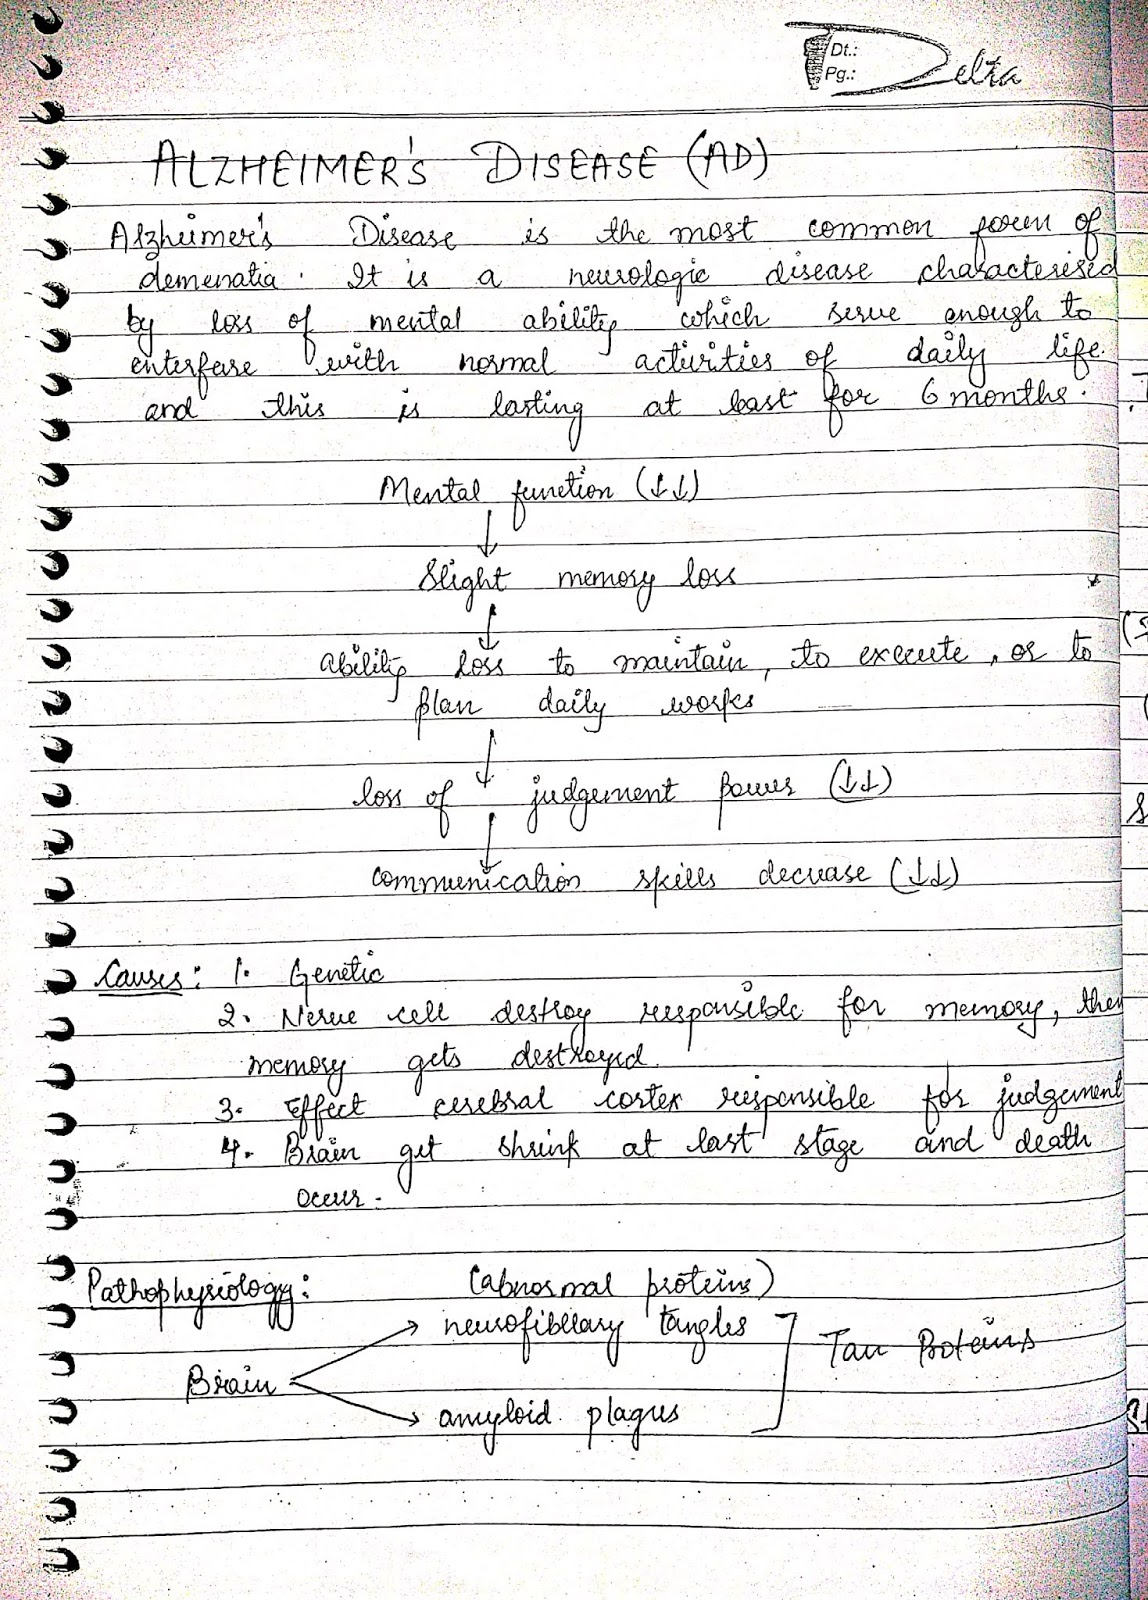 pathophysiology - nervous system disorder schizophrenia disorder